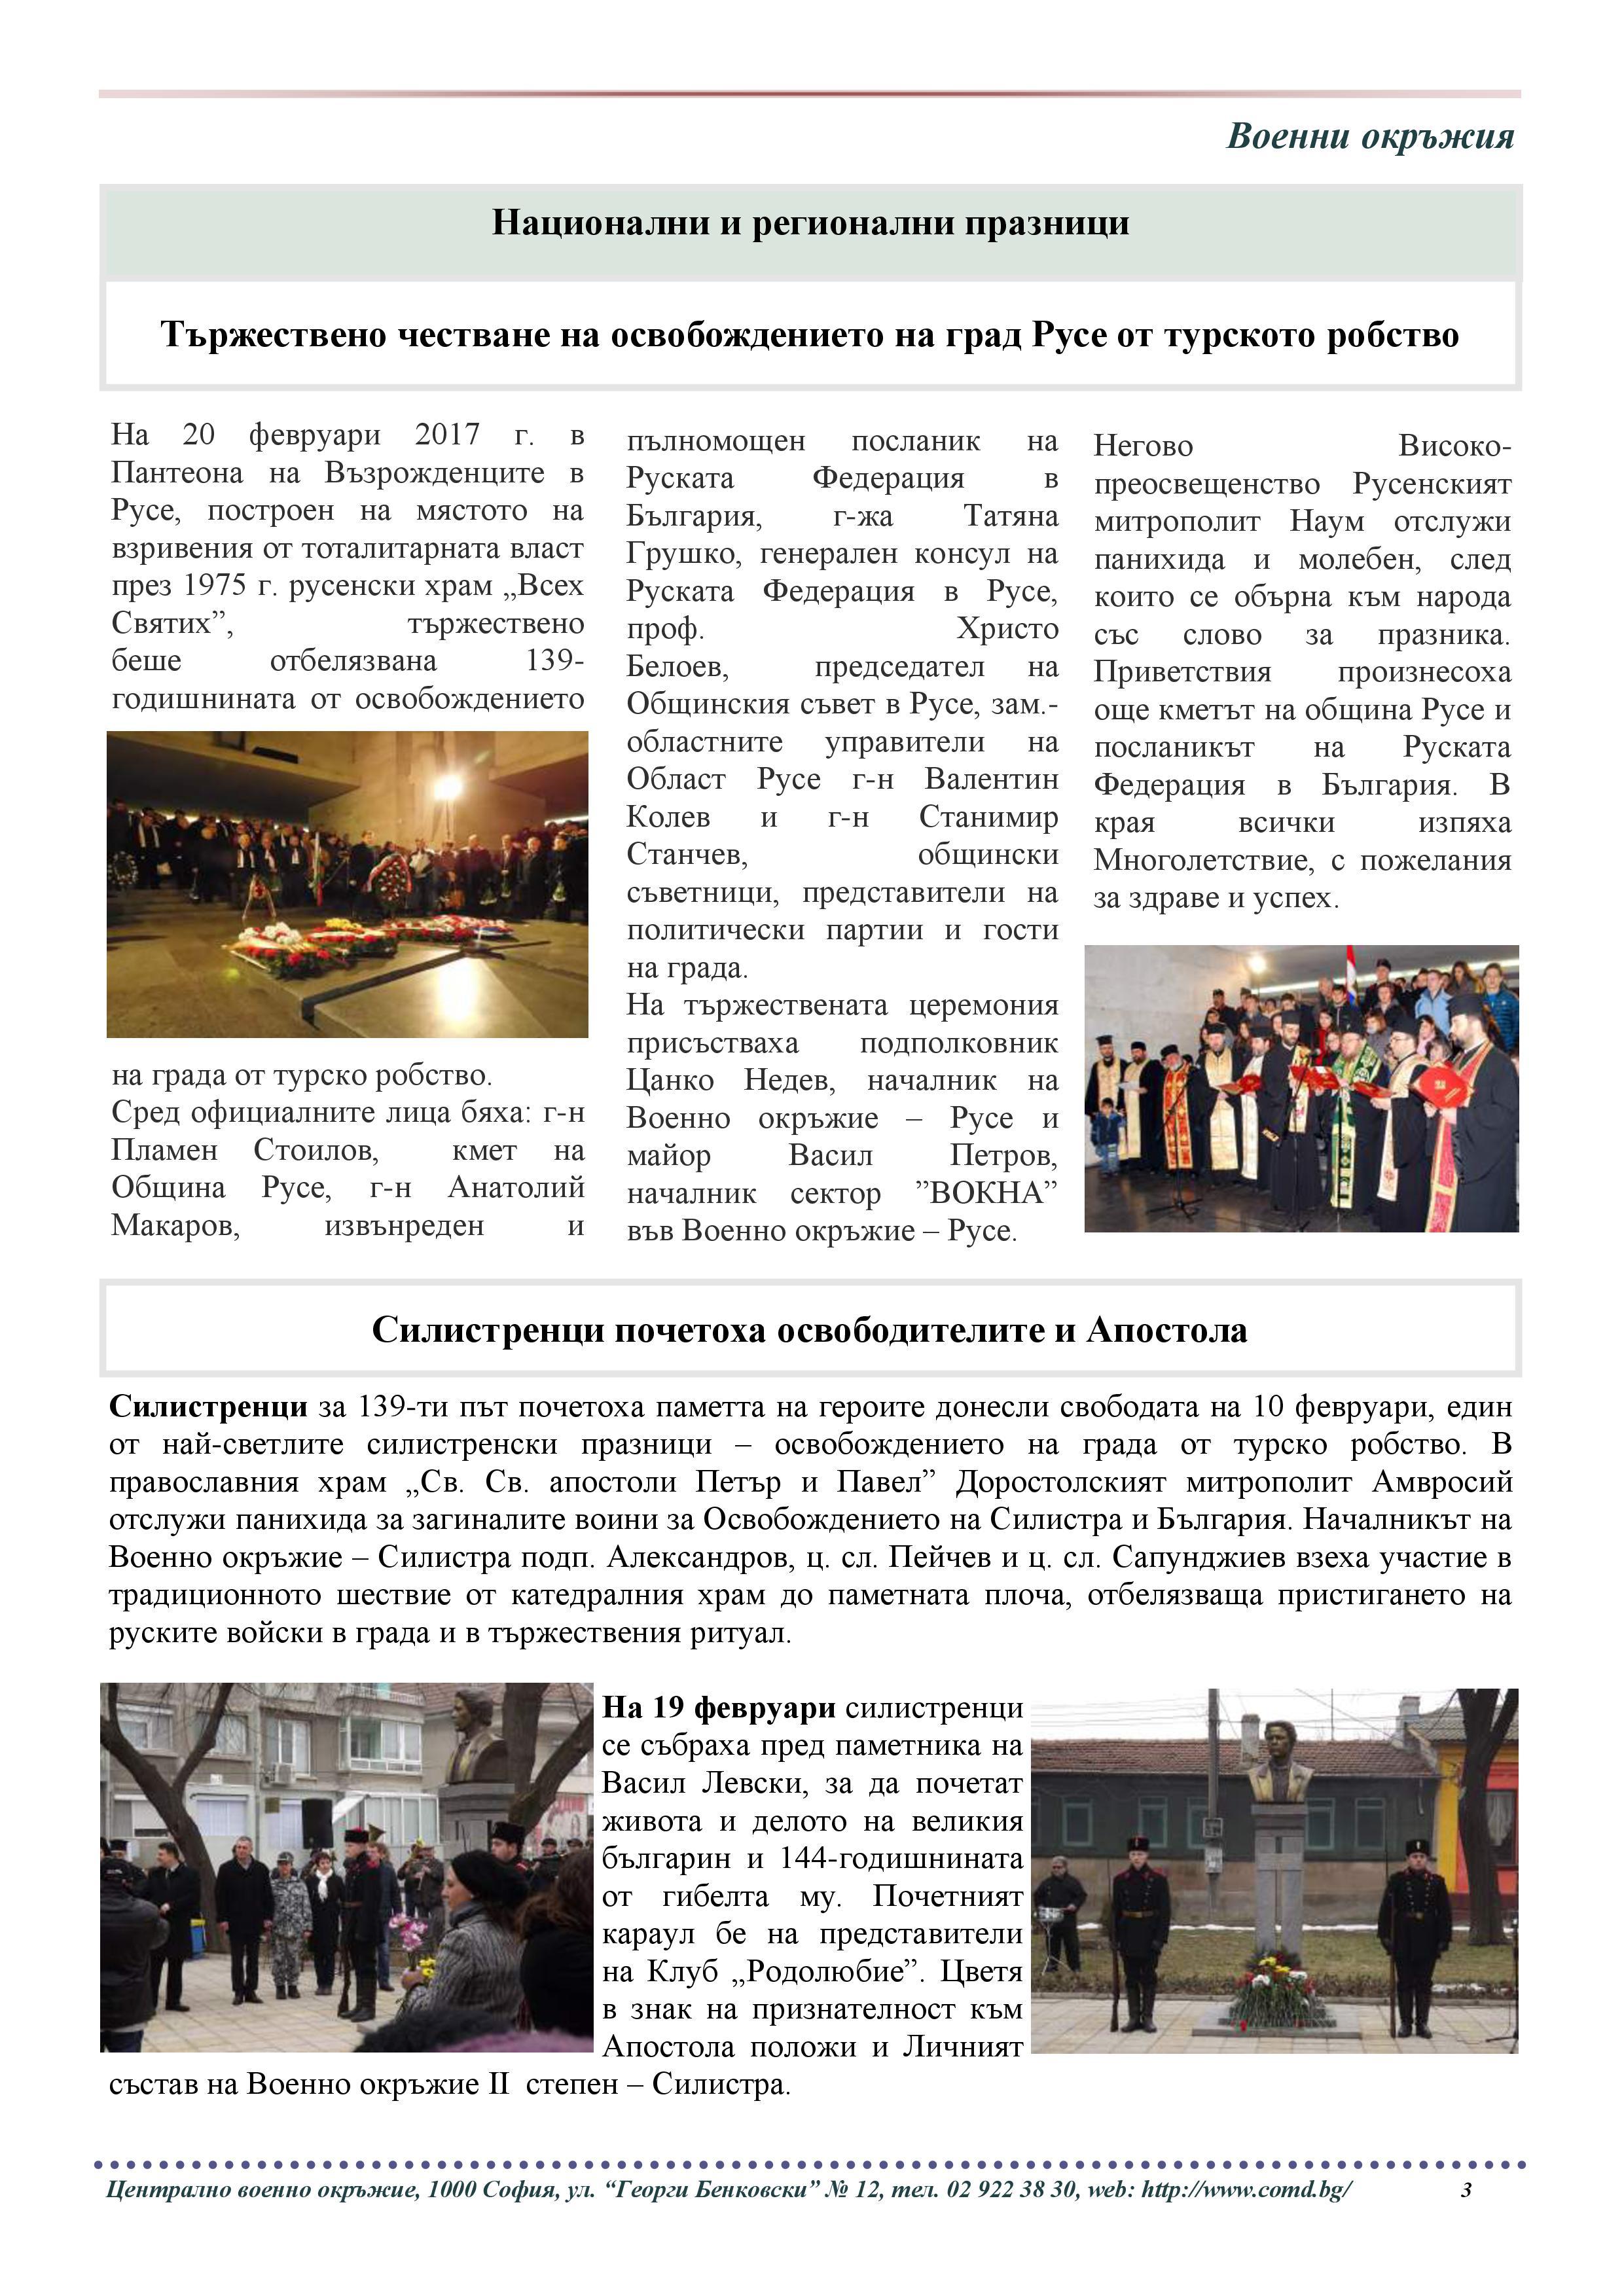 http://armymedia.bg/wp-content/uploads/2015/06/IB_2_2017g.compressed-za-izpra6tane-22.03.2017.page03.jpg